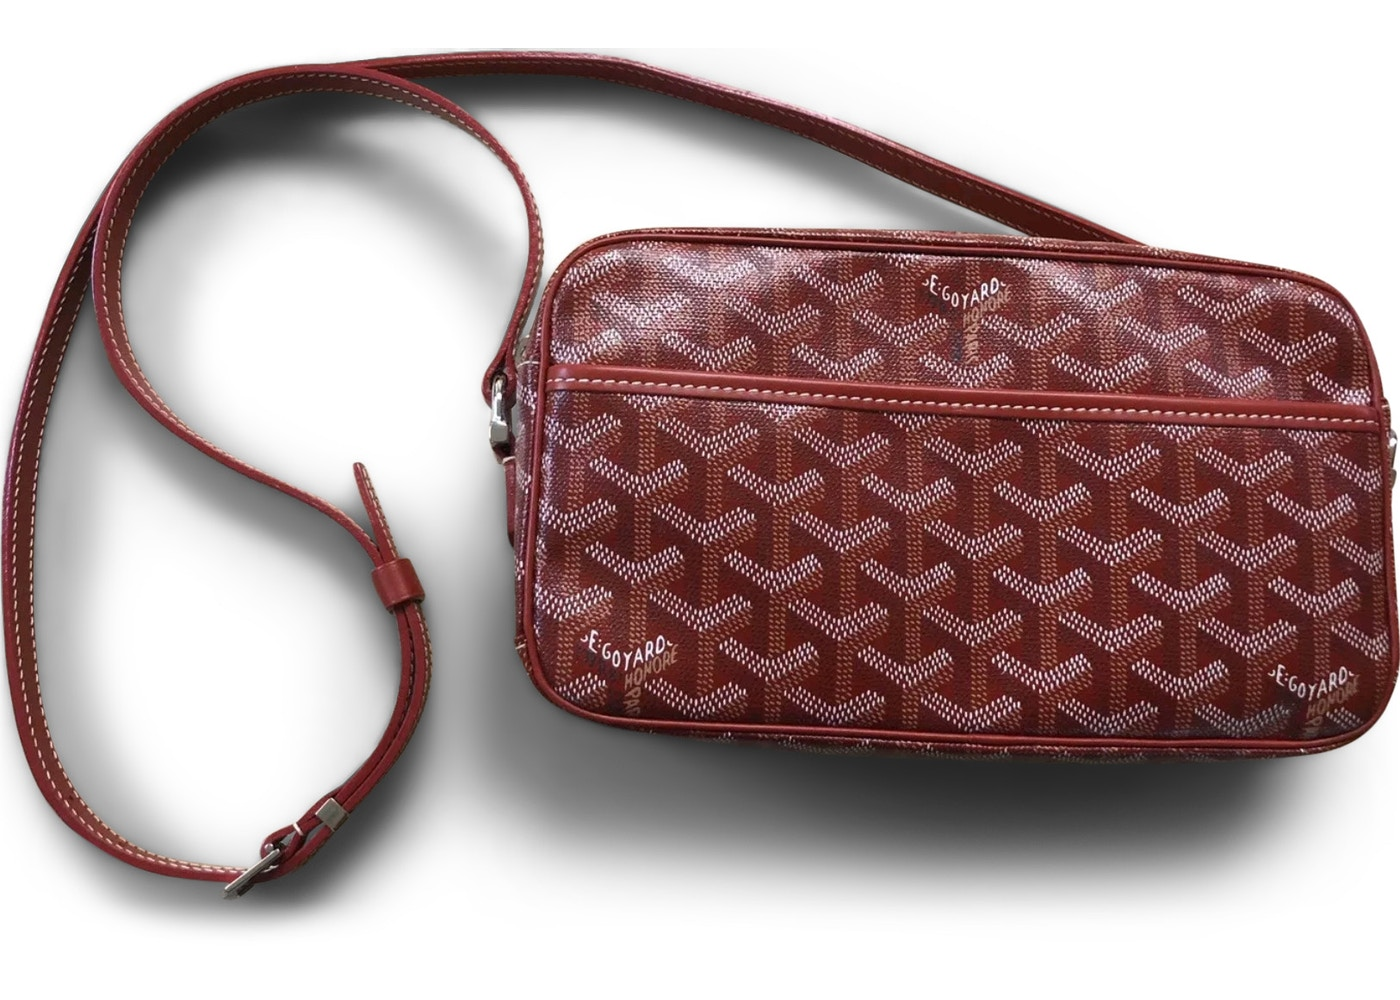 eeb9cfa99fc Buy   Sell Goyard Handbags - New Lowest Asks